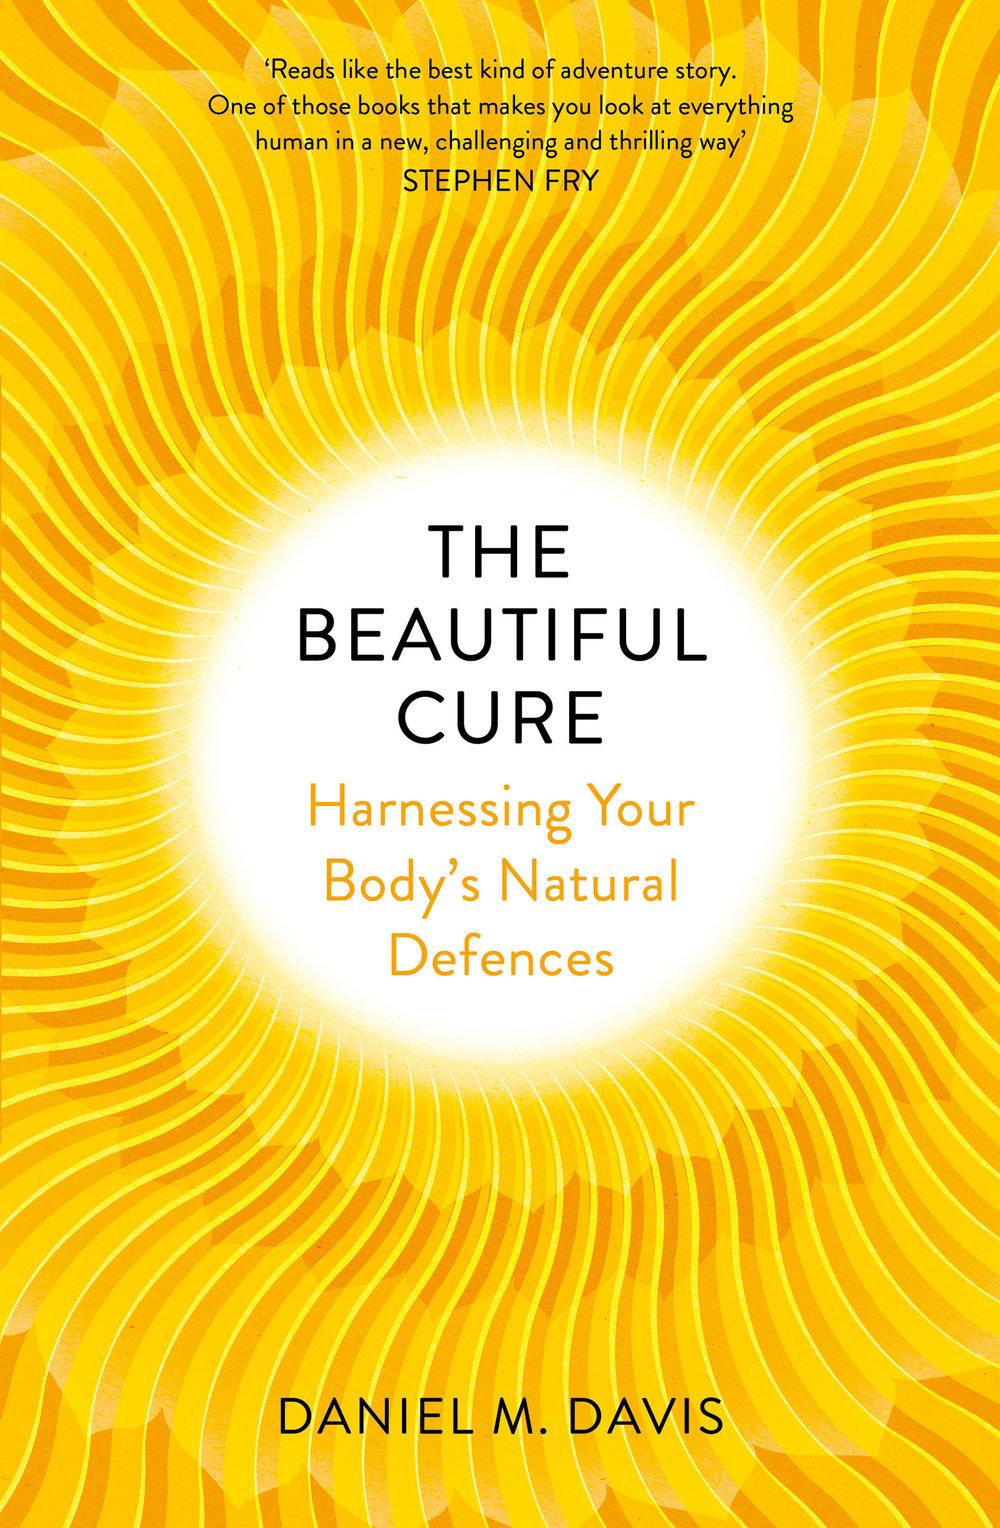 The Beautiful Cure.jpg